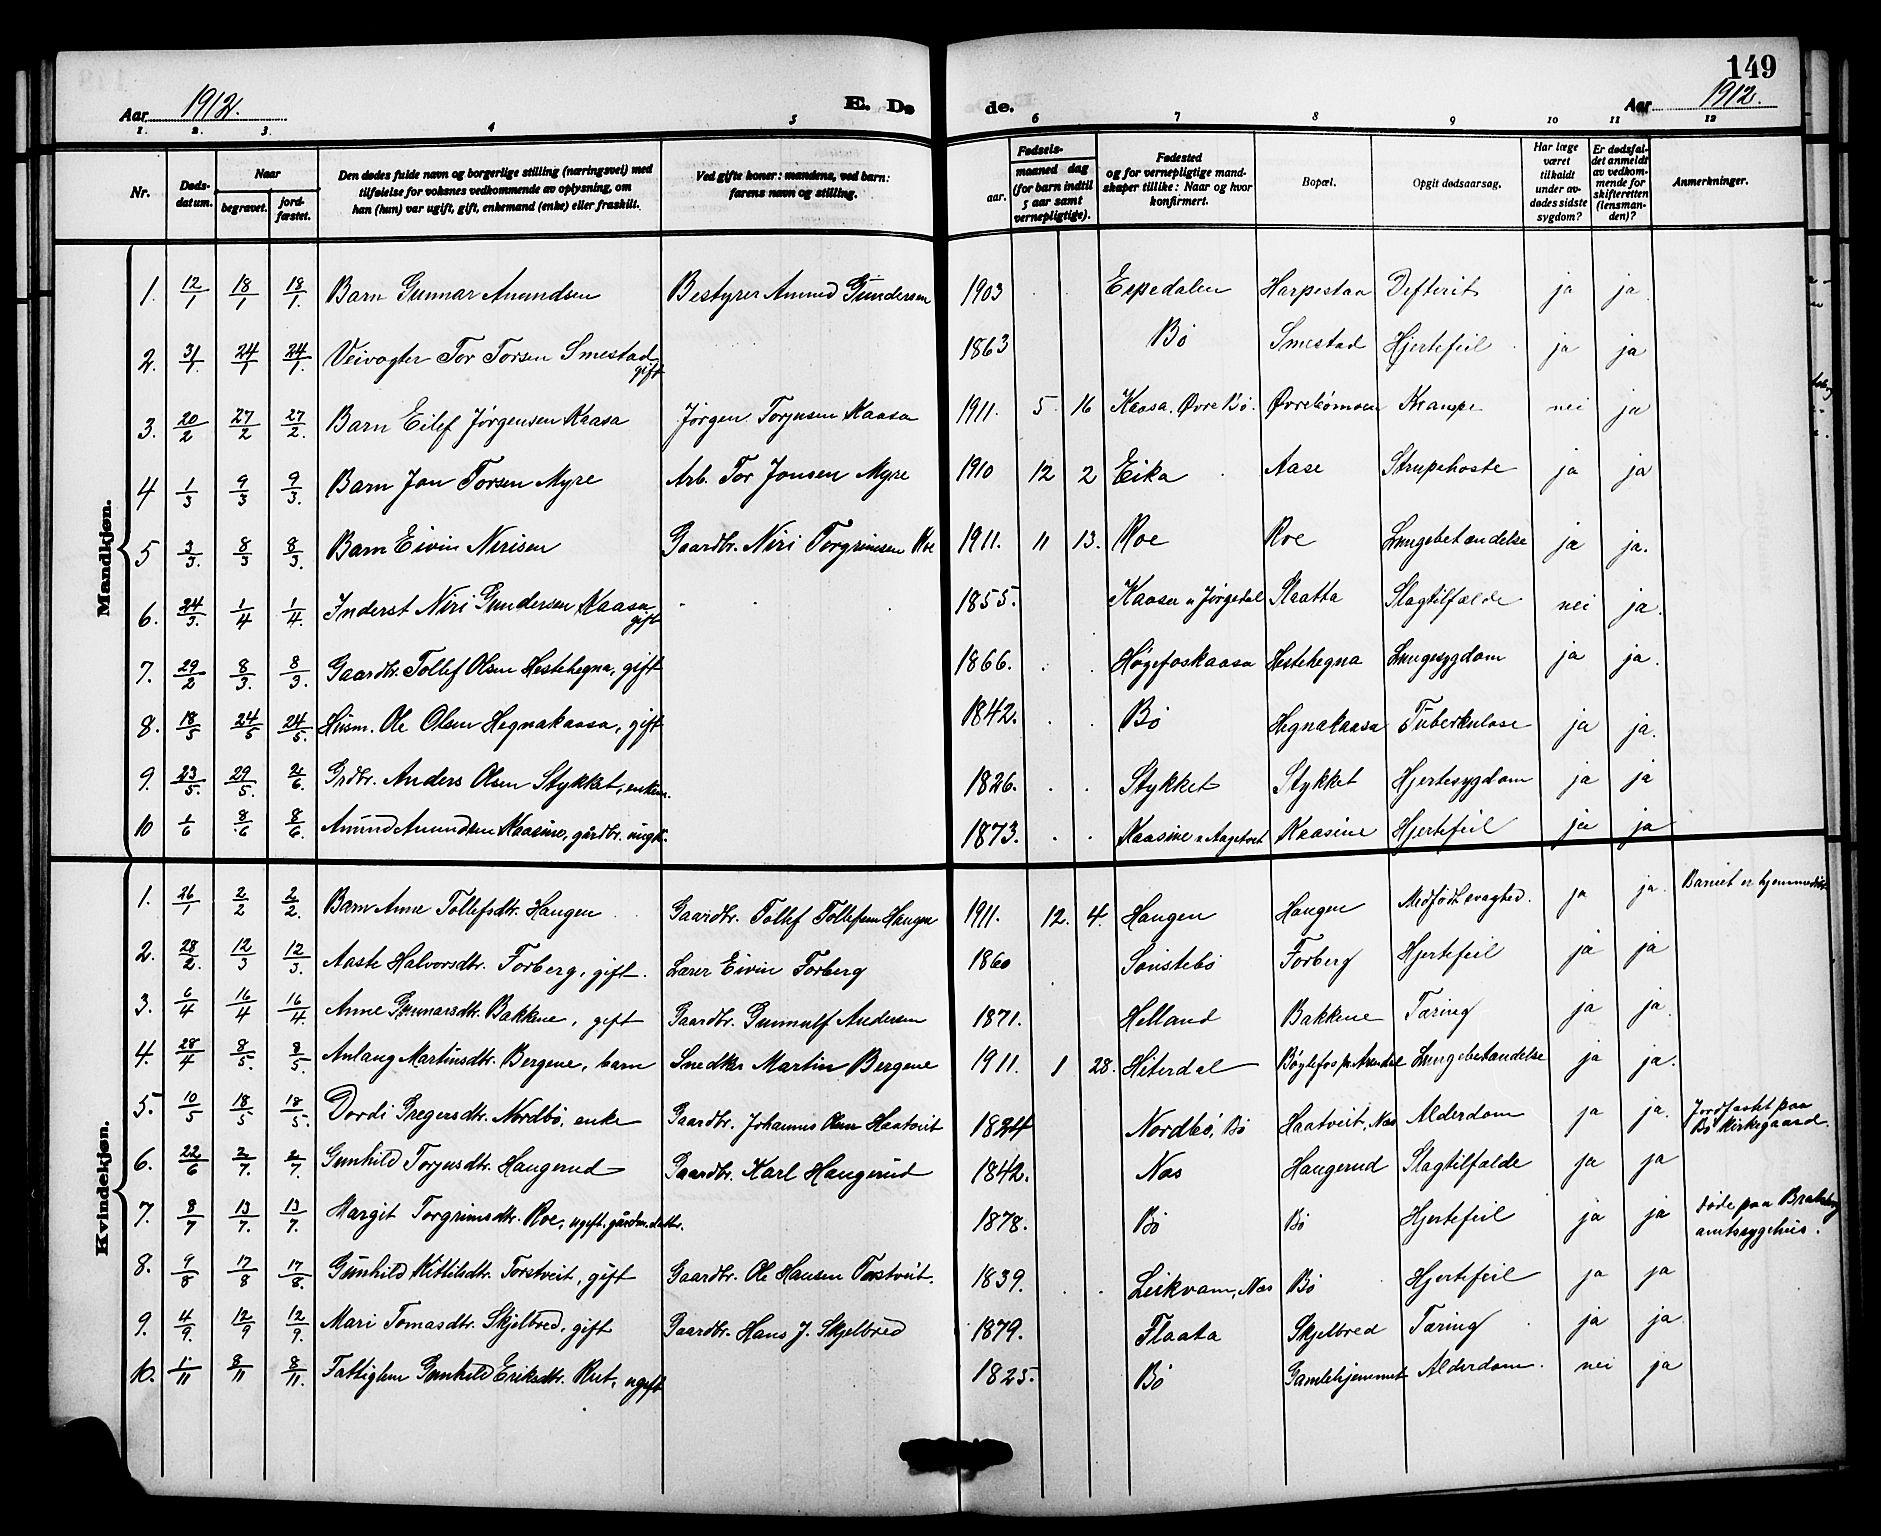 SAKO, Bø kirkebøker, G/Ga/L0007: Klokkerbok nr. 7, 1909-1924, s. 149